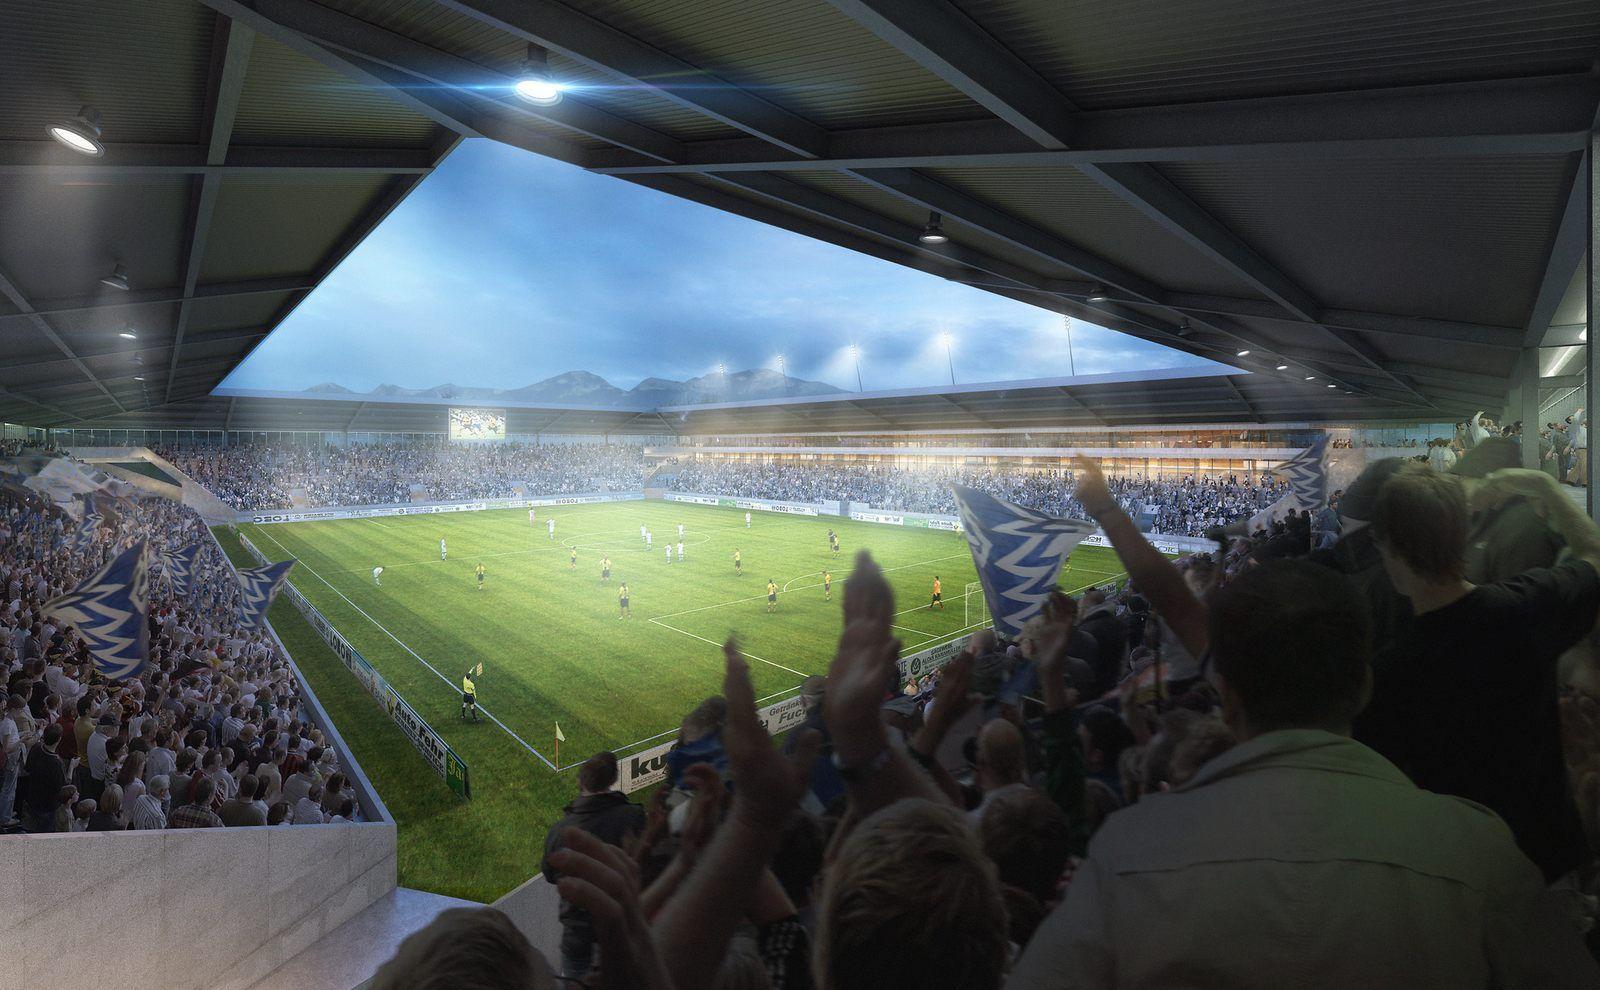 Projekt Nouveau Stade Lausanne Stadiony Net